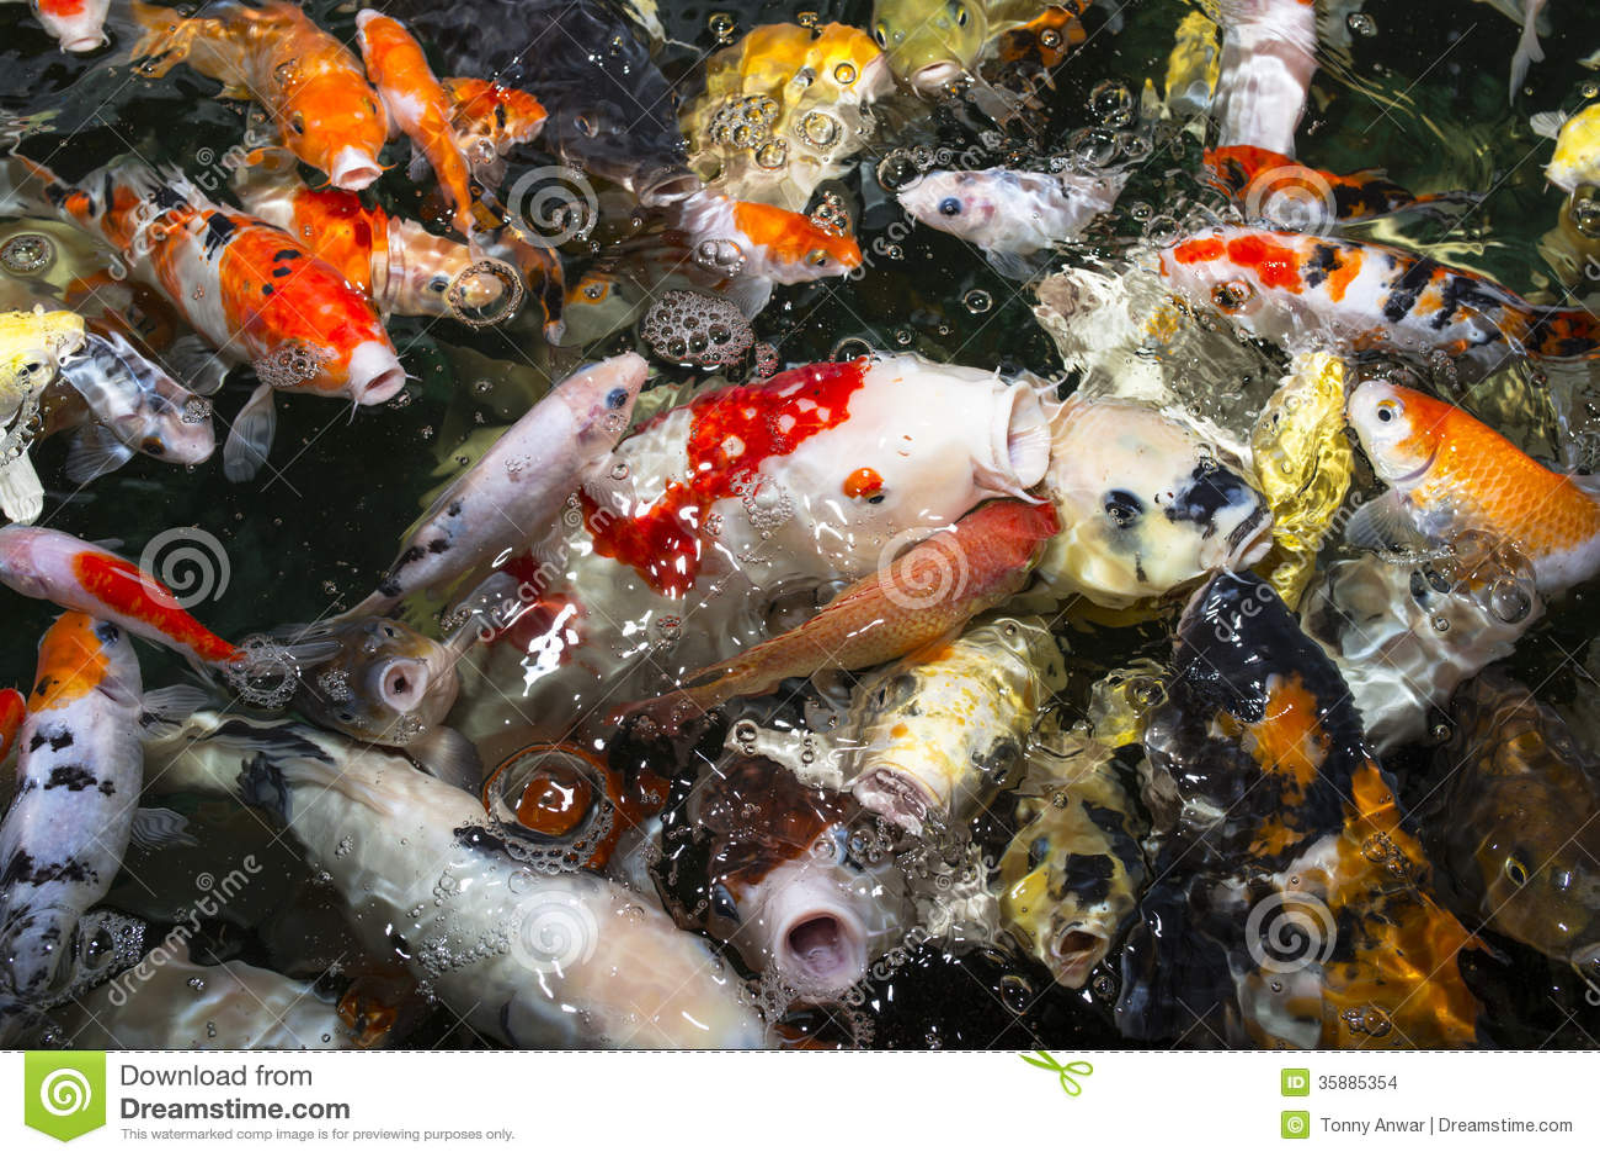 Ornamental koi 100 images colorful ornamental koi fish for Decorative carp